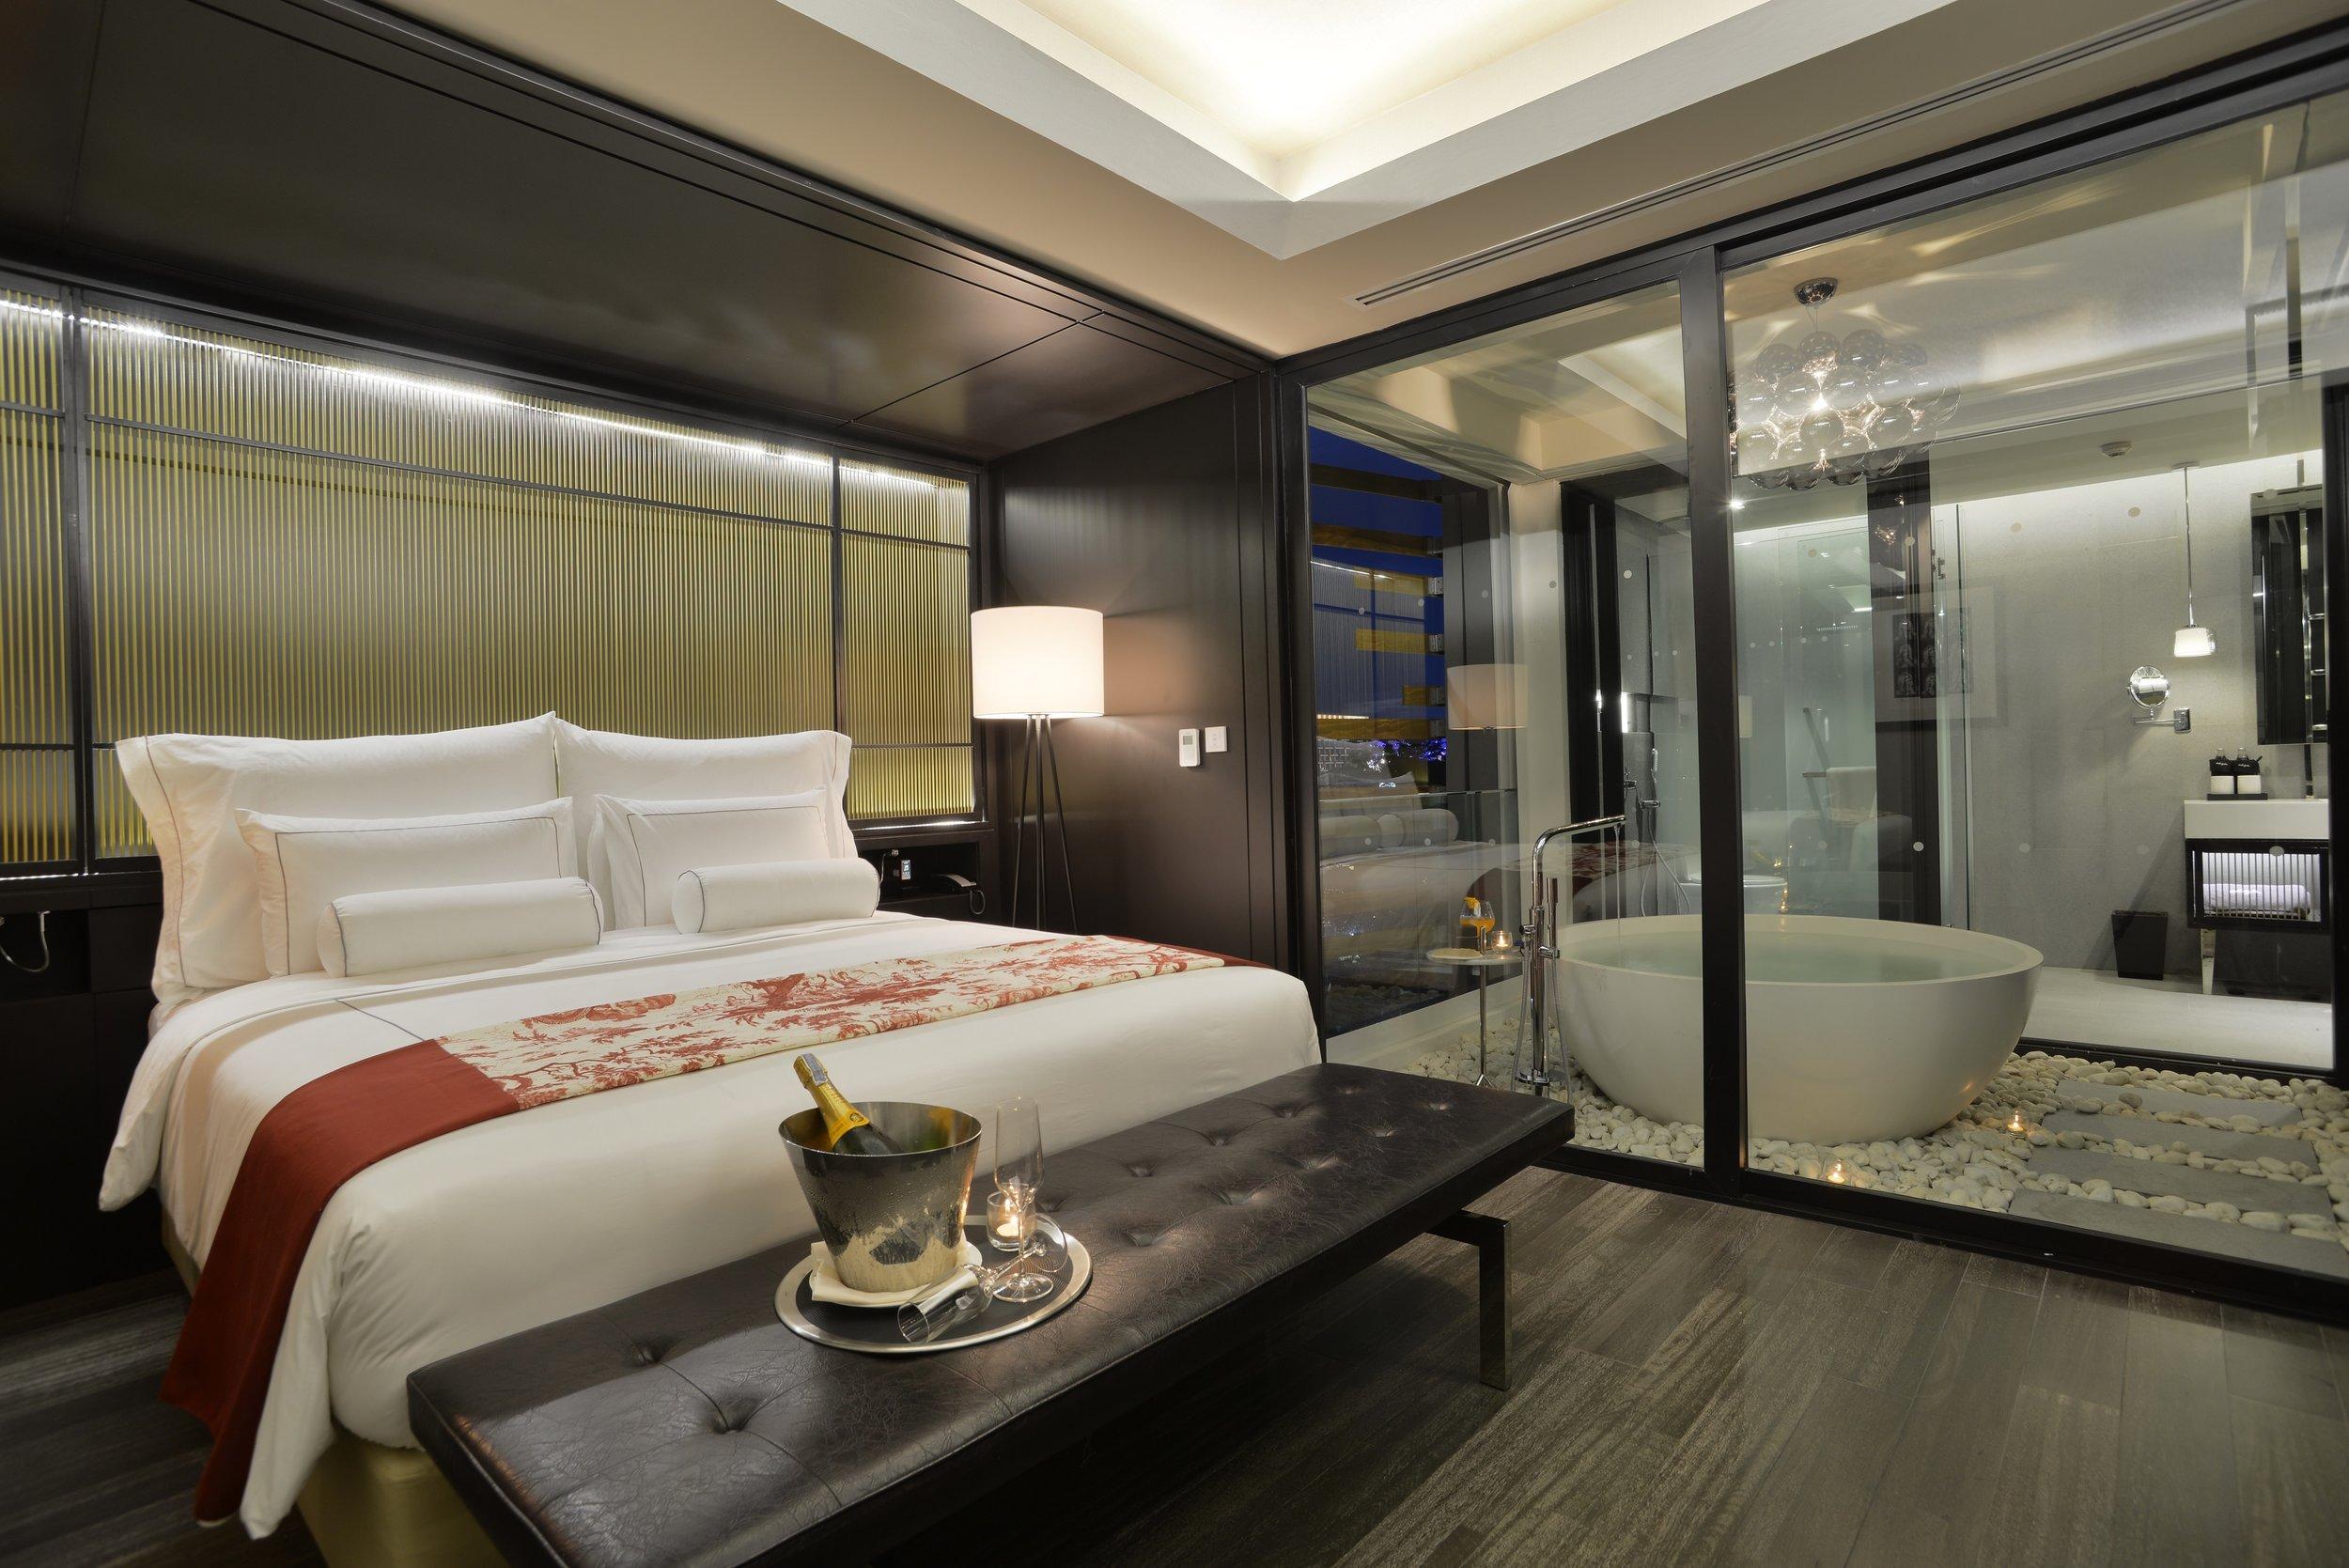 room bed3.JPG